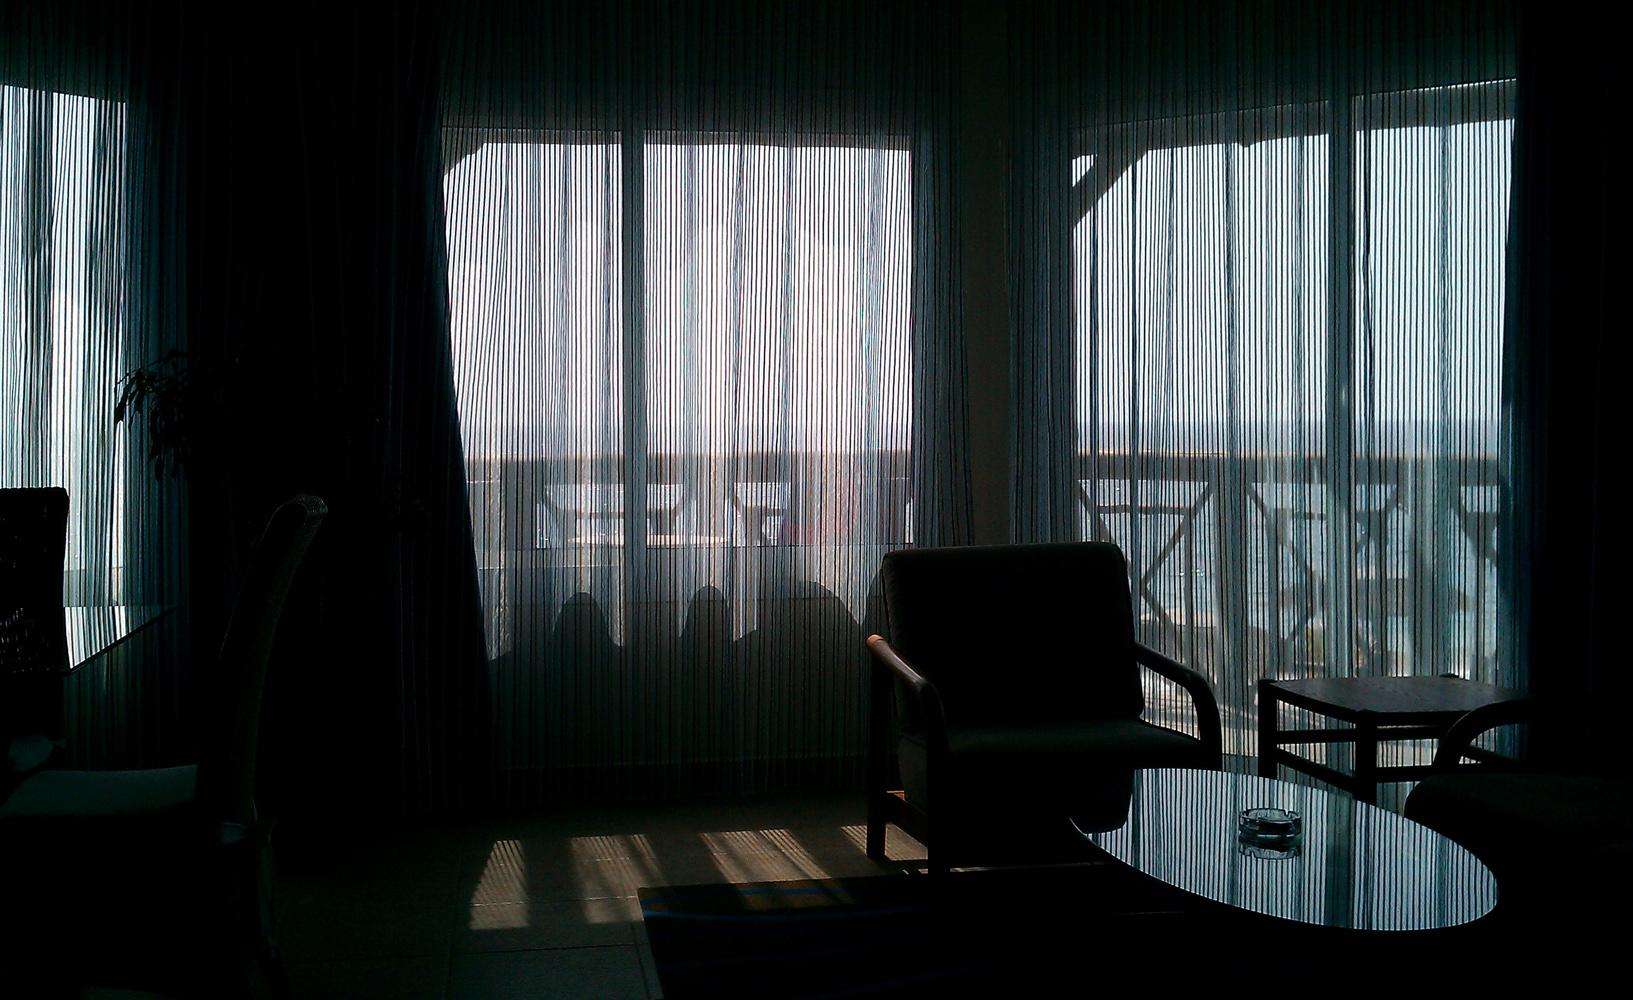 Hotel Life - From my window - The ocean, Dibba Al-Fujaira, UAEh